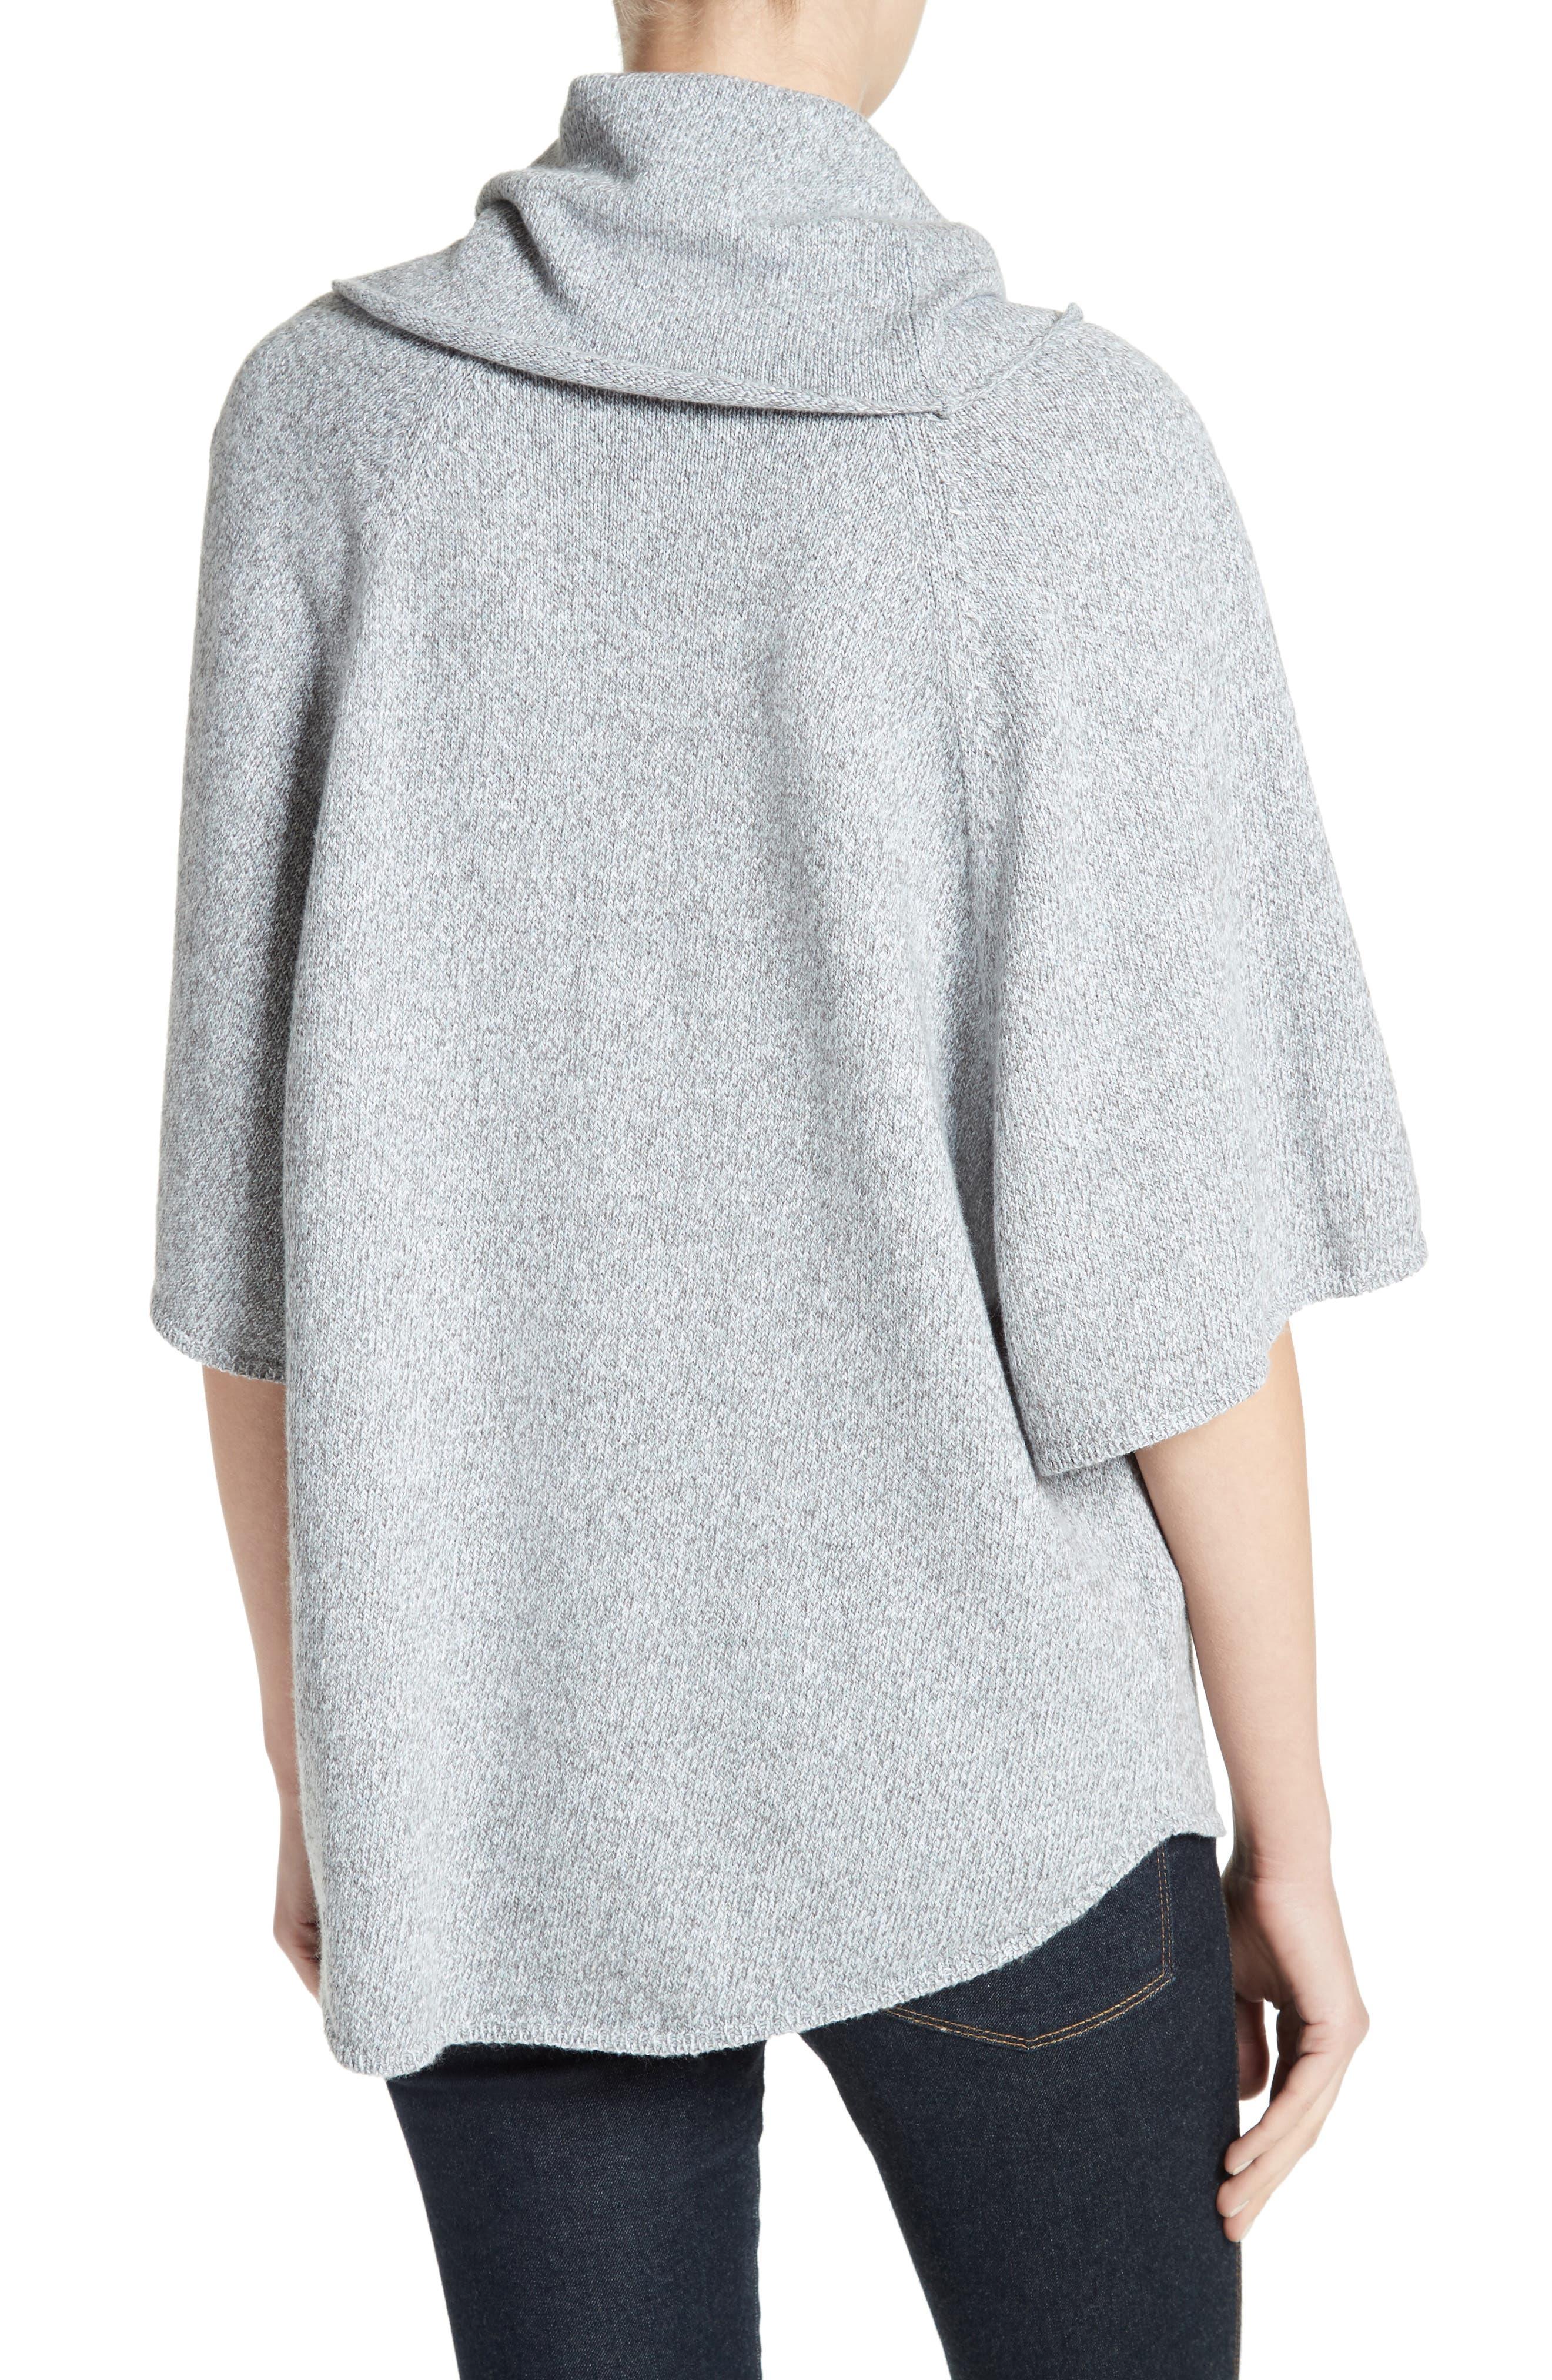 Celia Cowl Neck Sweater,                             Alternate thumbnail 2, color,